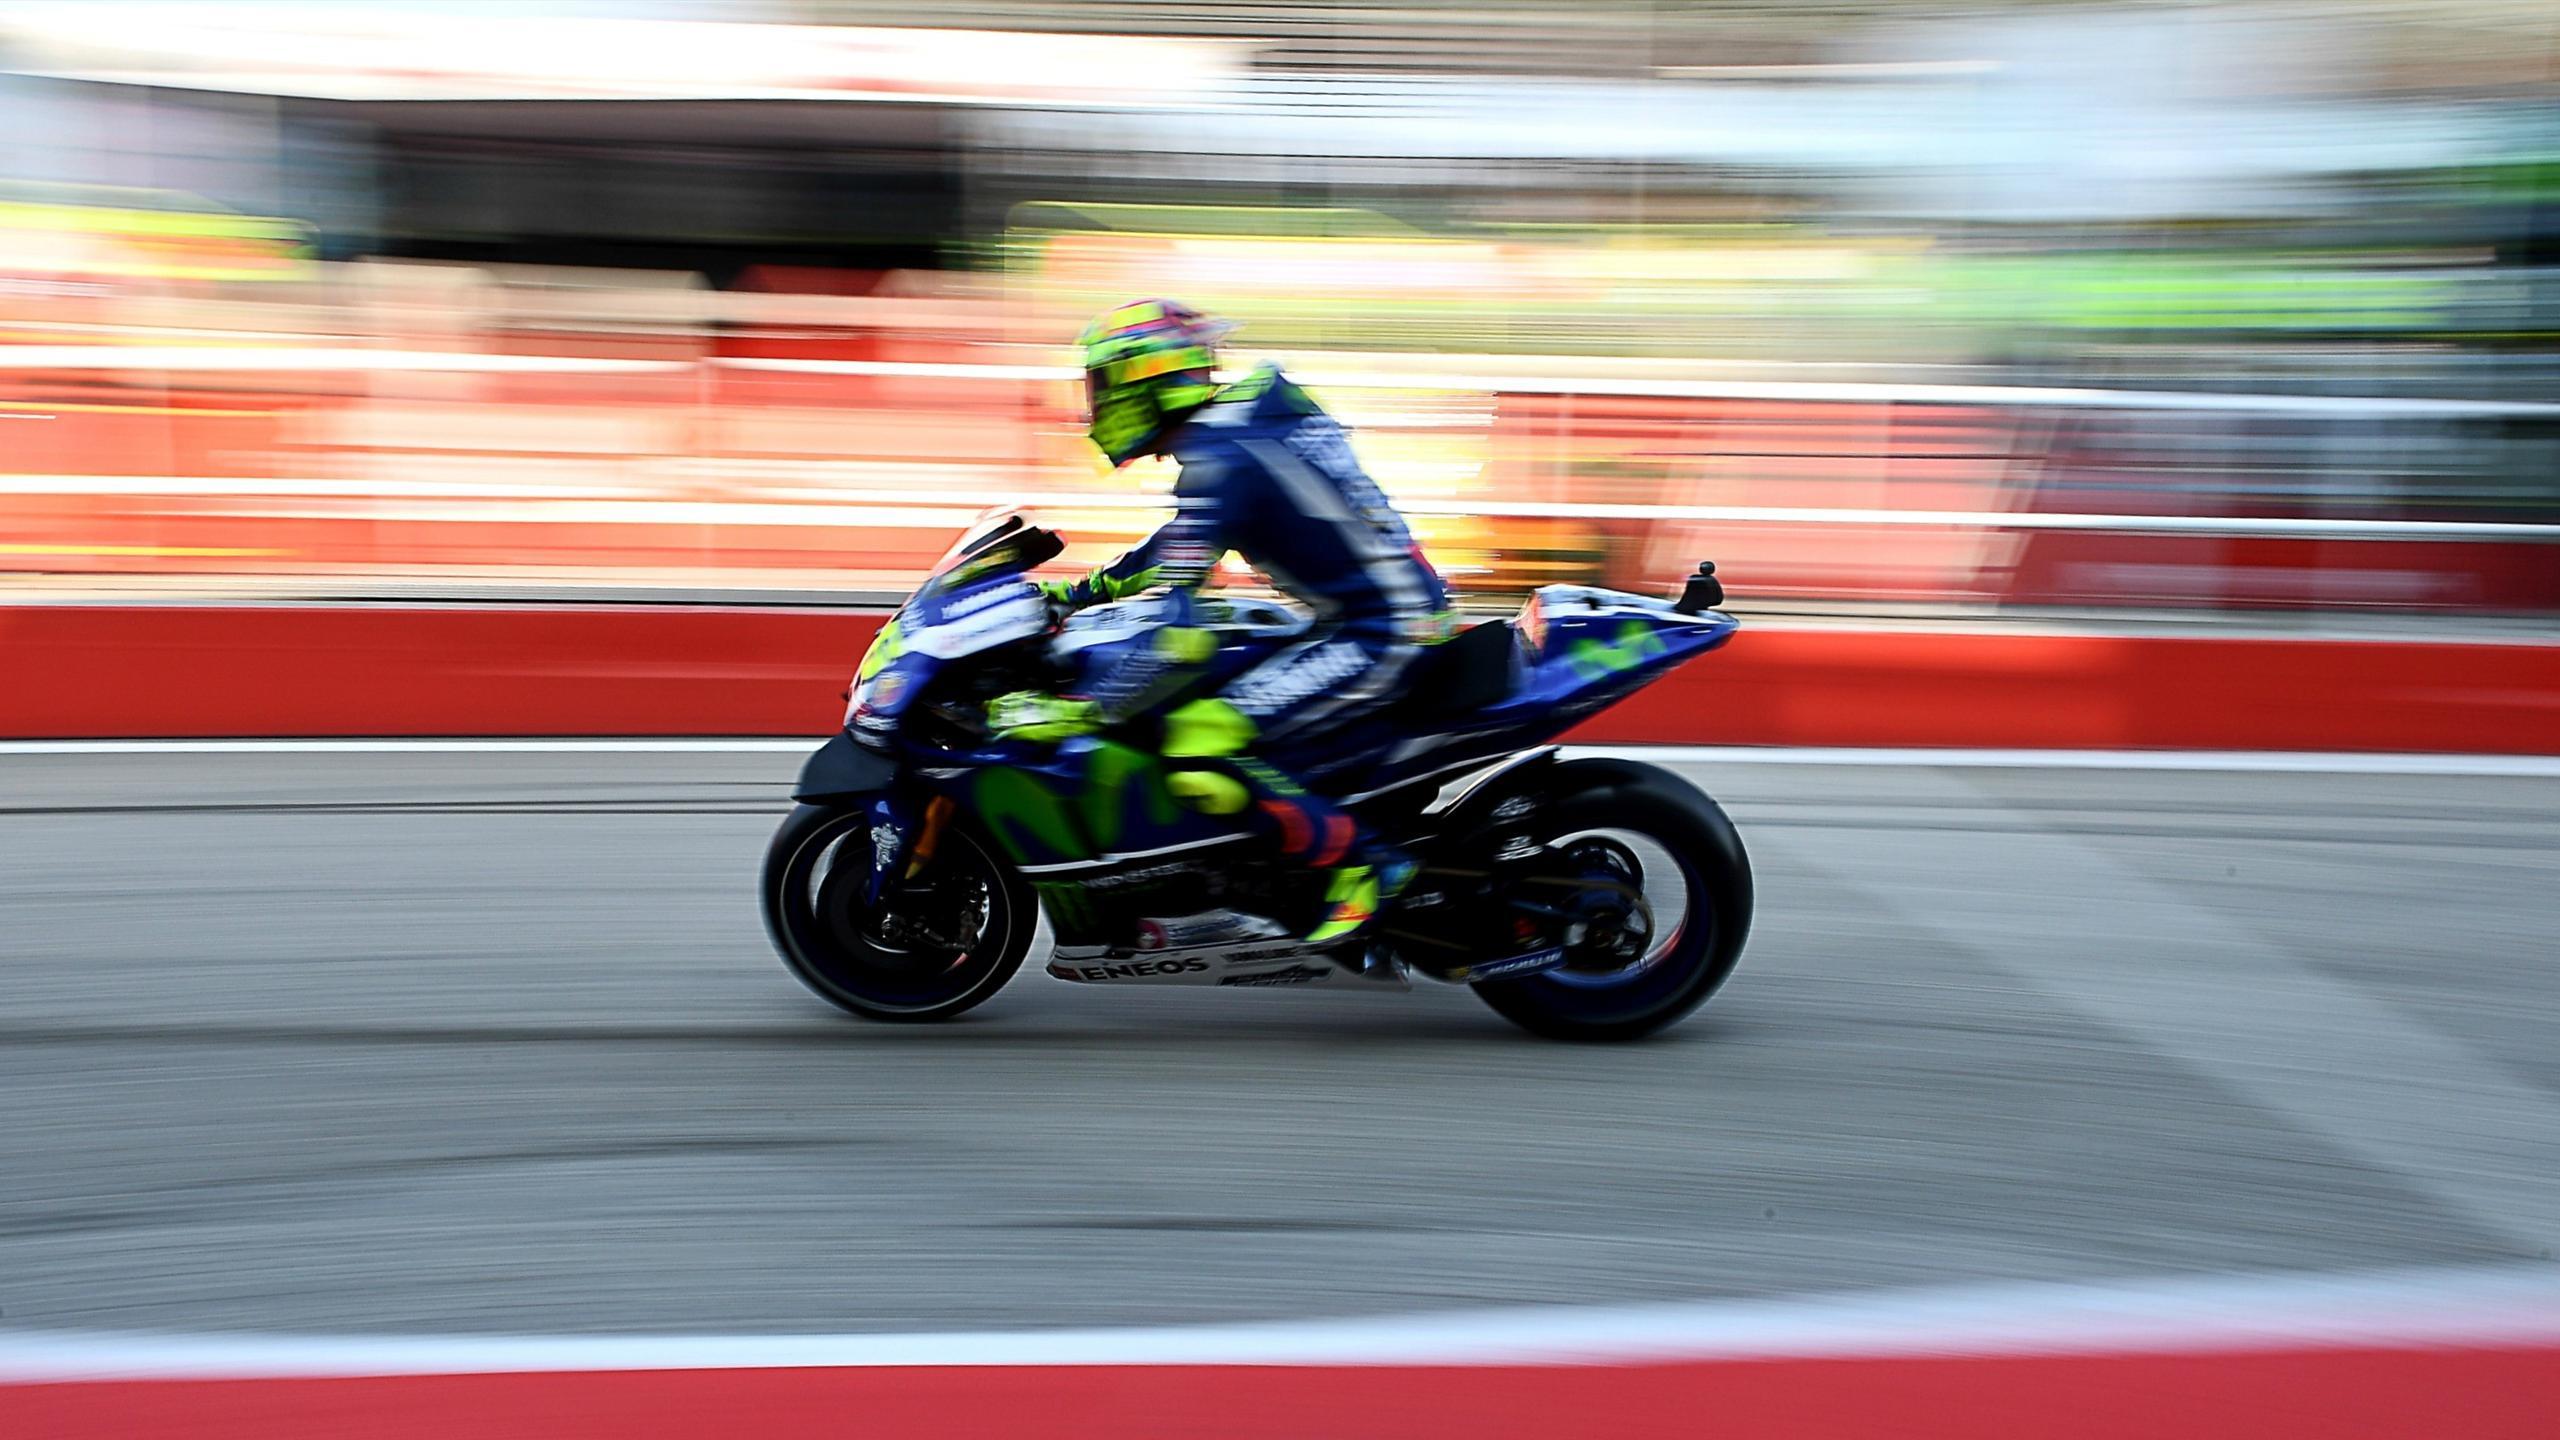 Valentino Rossi (Yamaha Factory) - GP of San Marino 2016